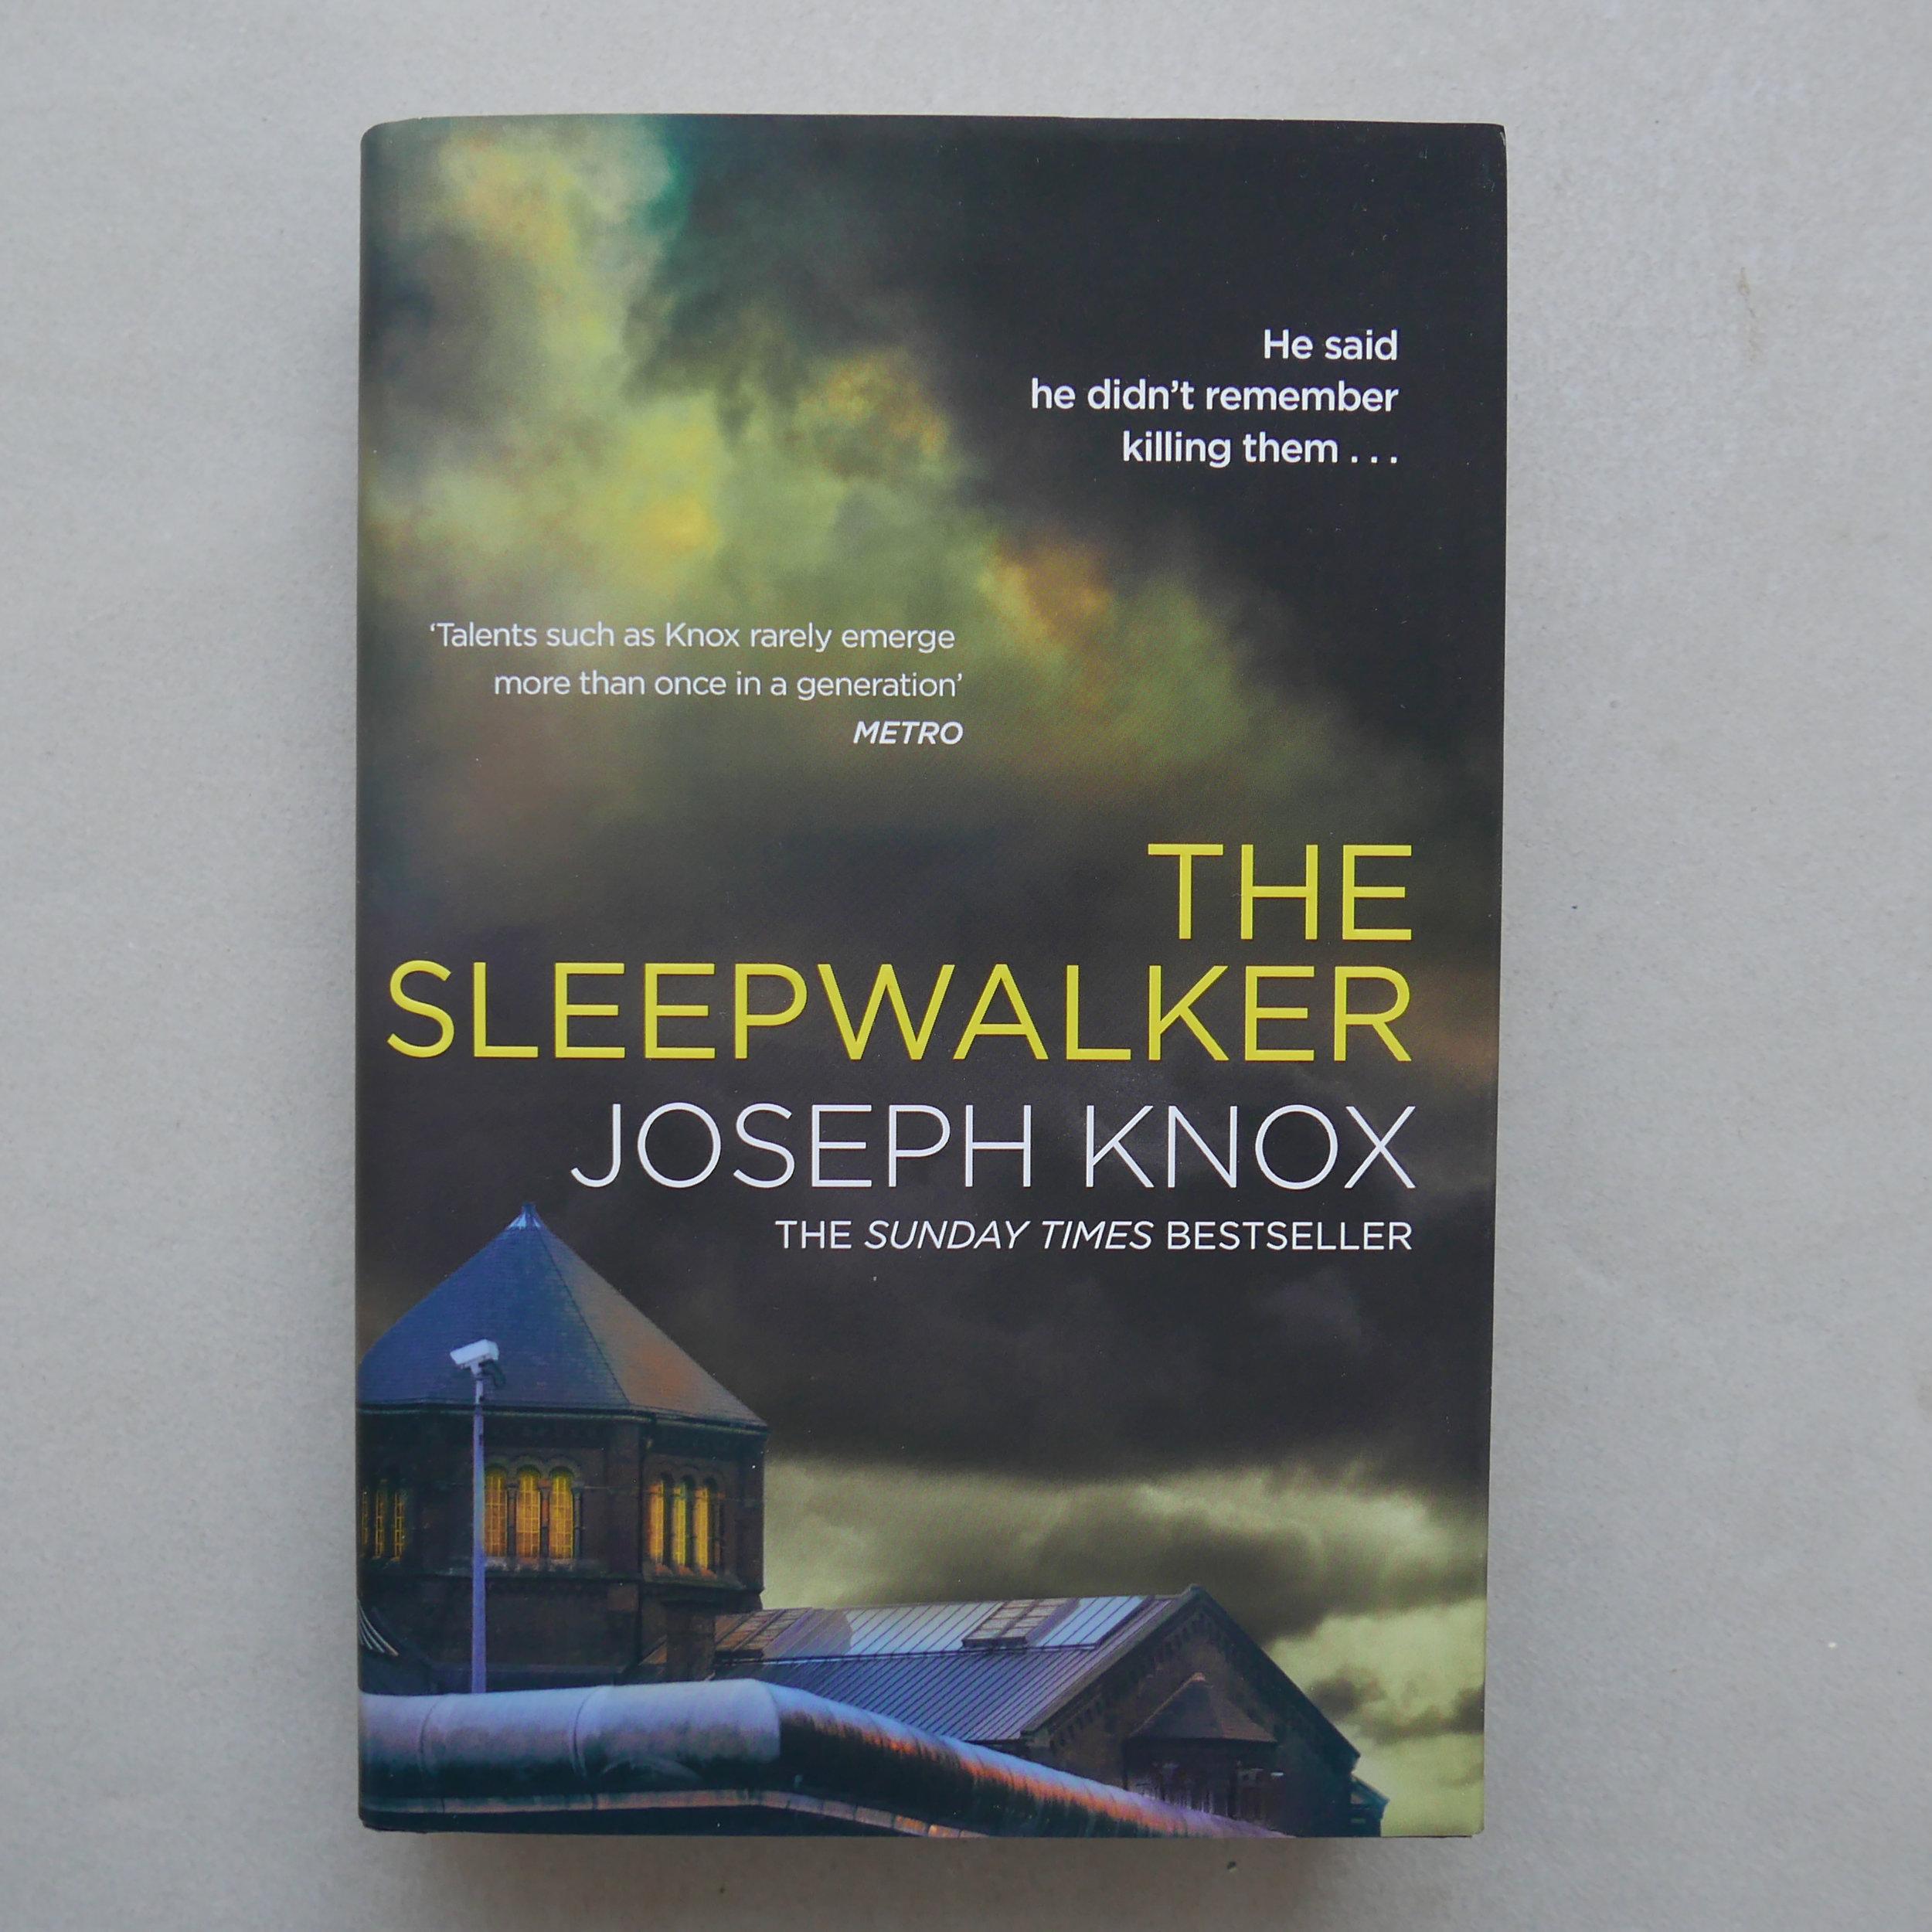 The Sleepwalker - Joseph Knox